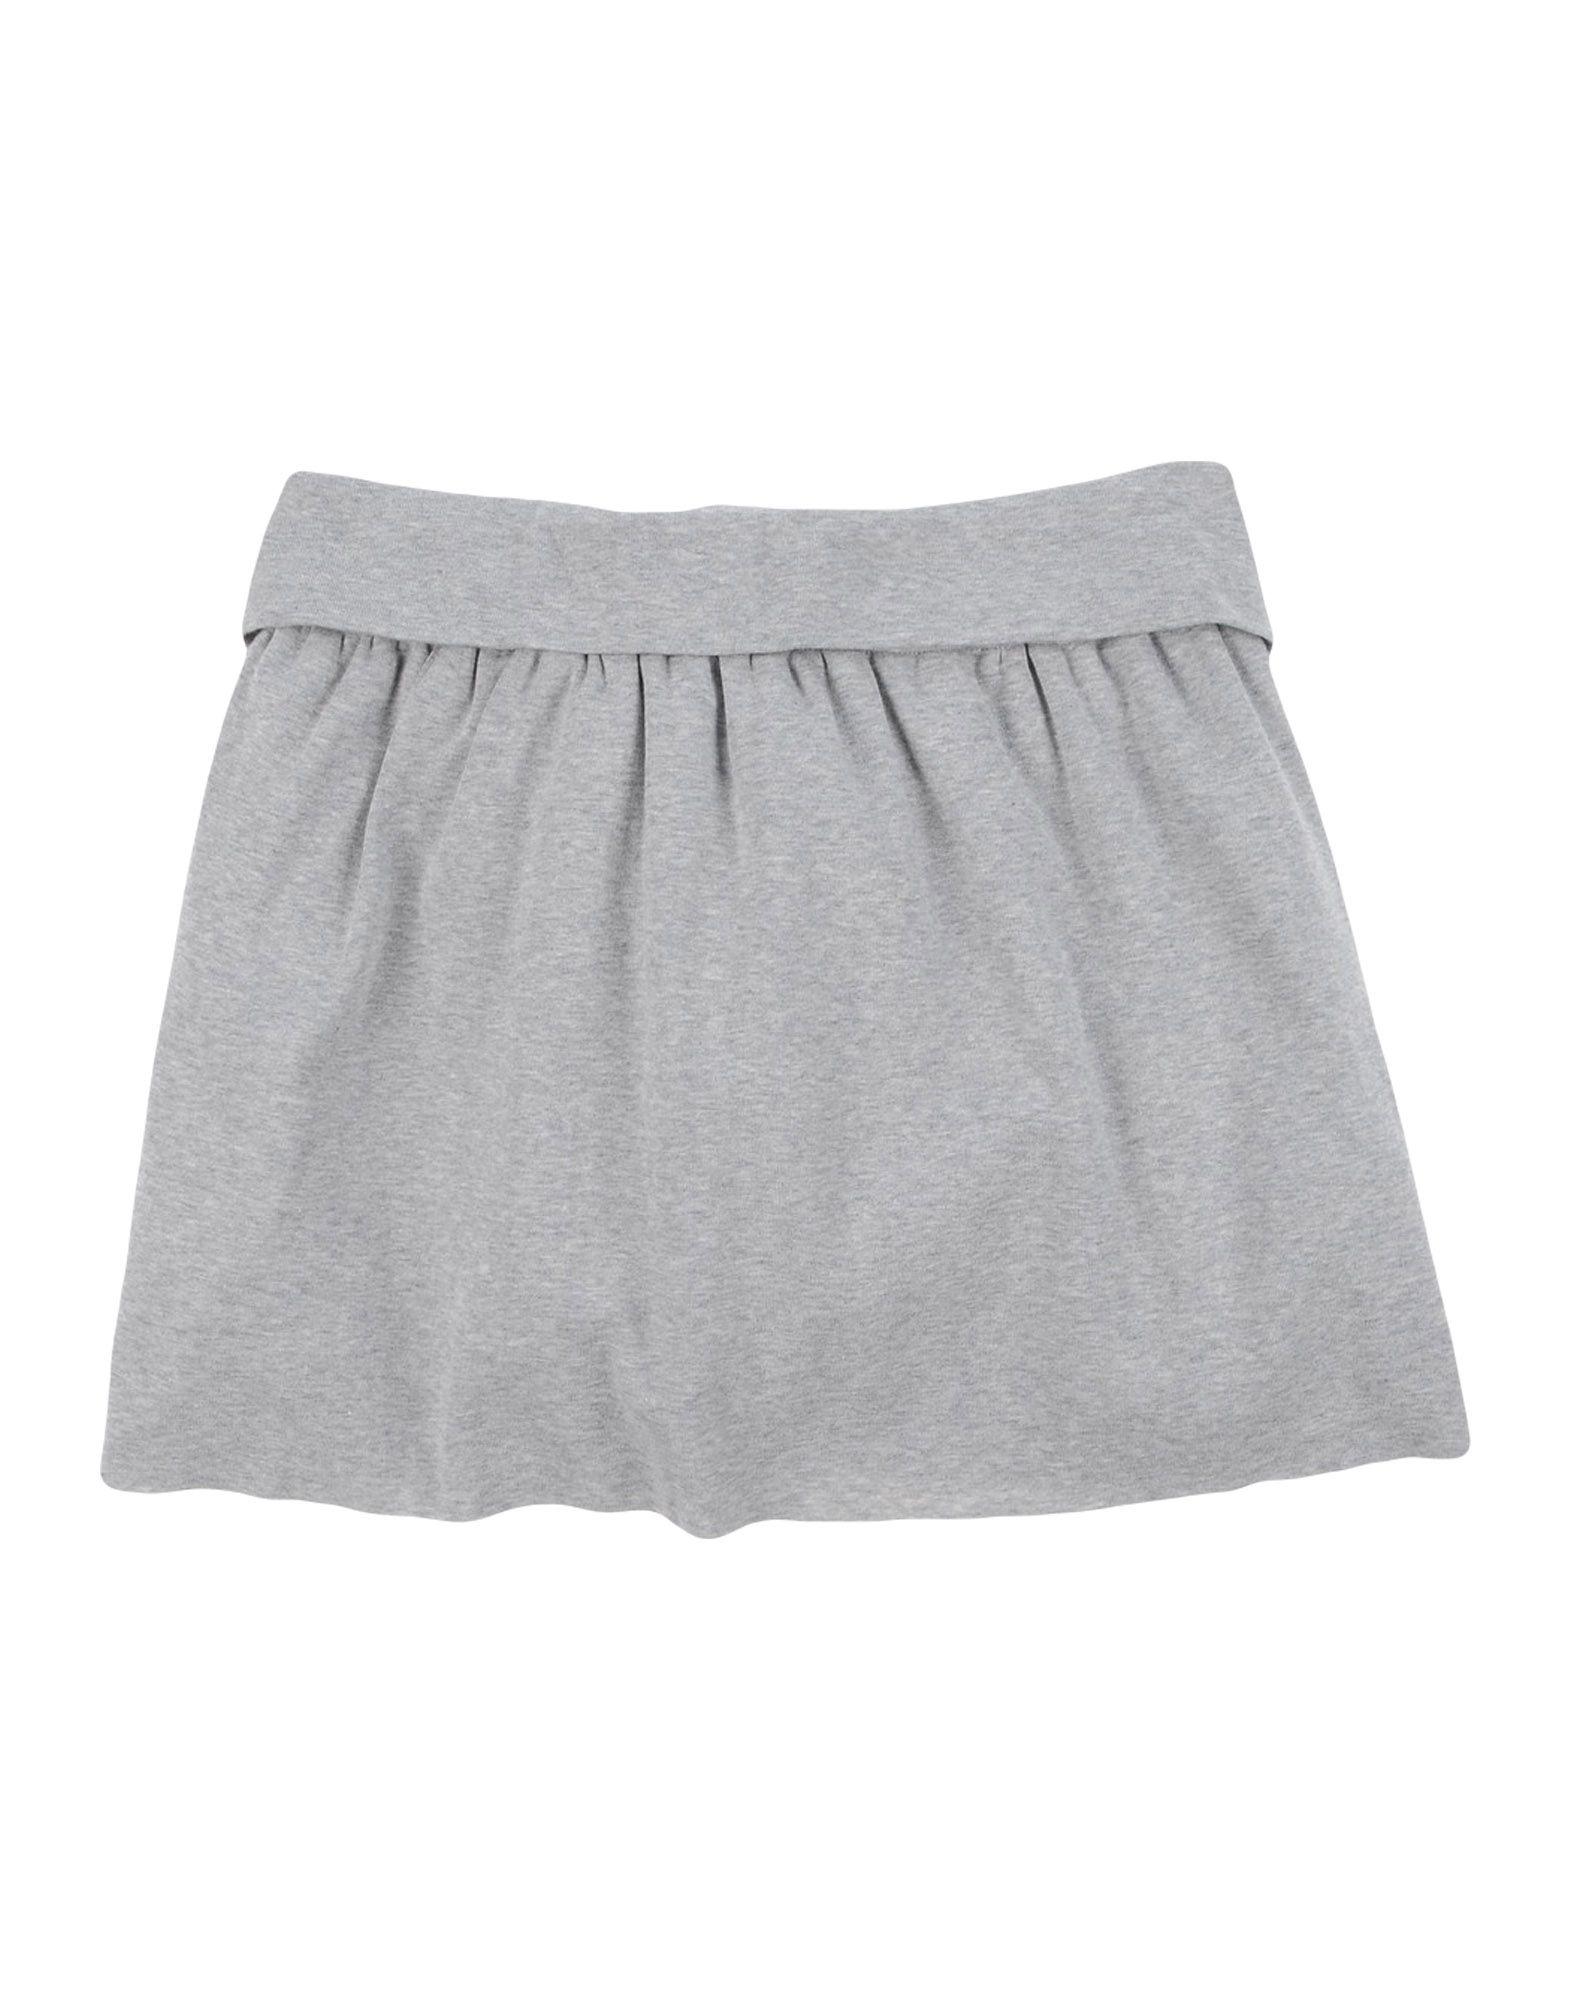 OPILILAI Skirt in Grey